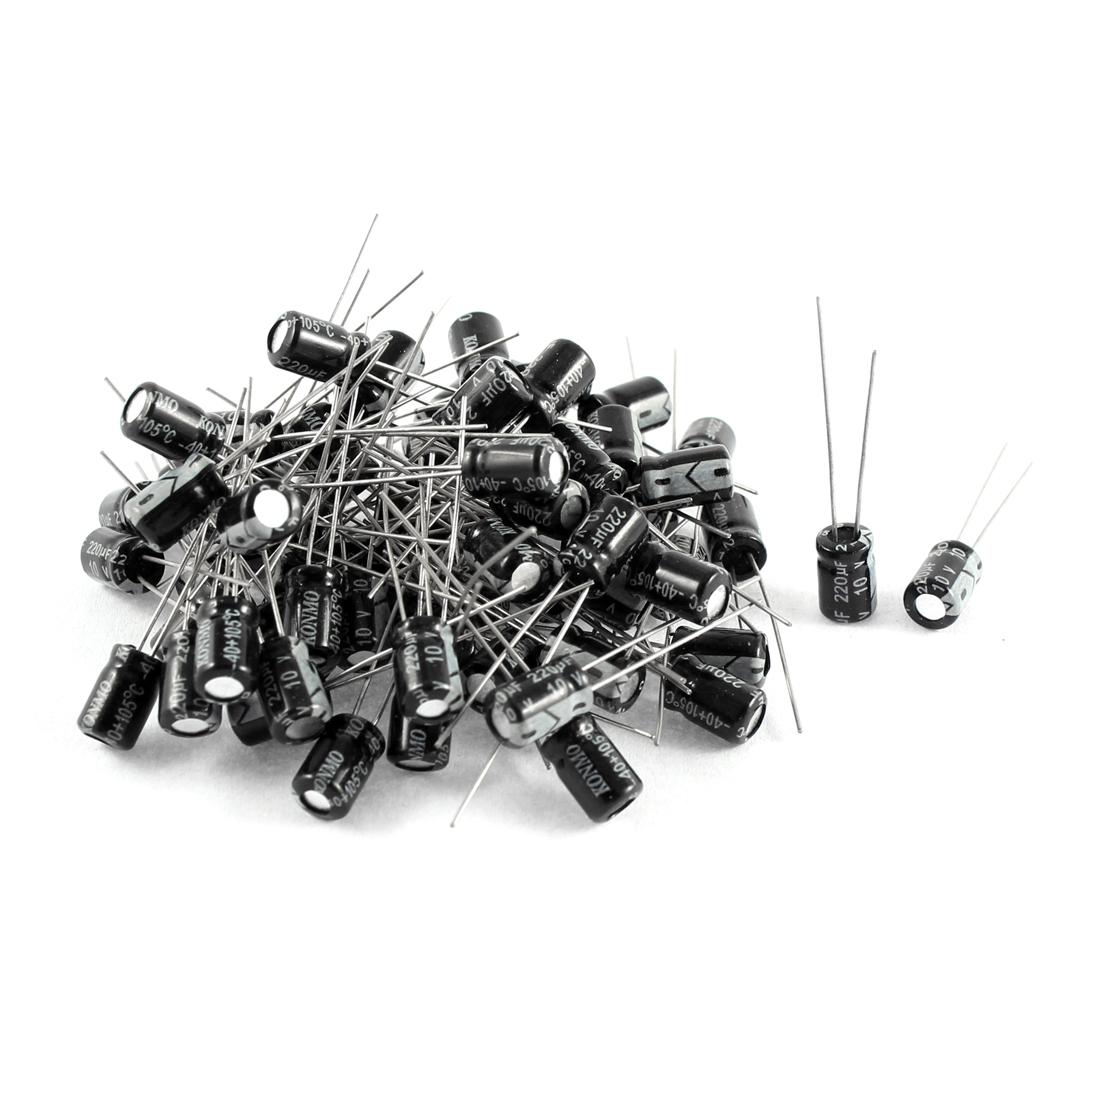 70 Pcs Black Aluminum Electrolytic Capacitors 220uF 10V Radial Lead 5mmx8mm